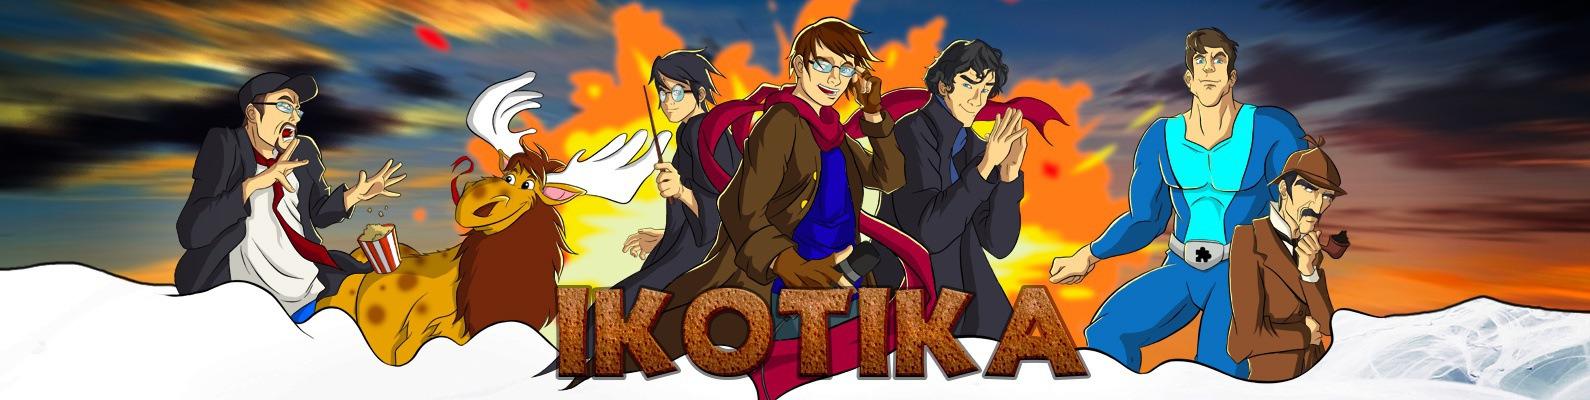 Сериал Ikotika